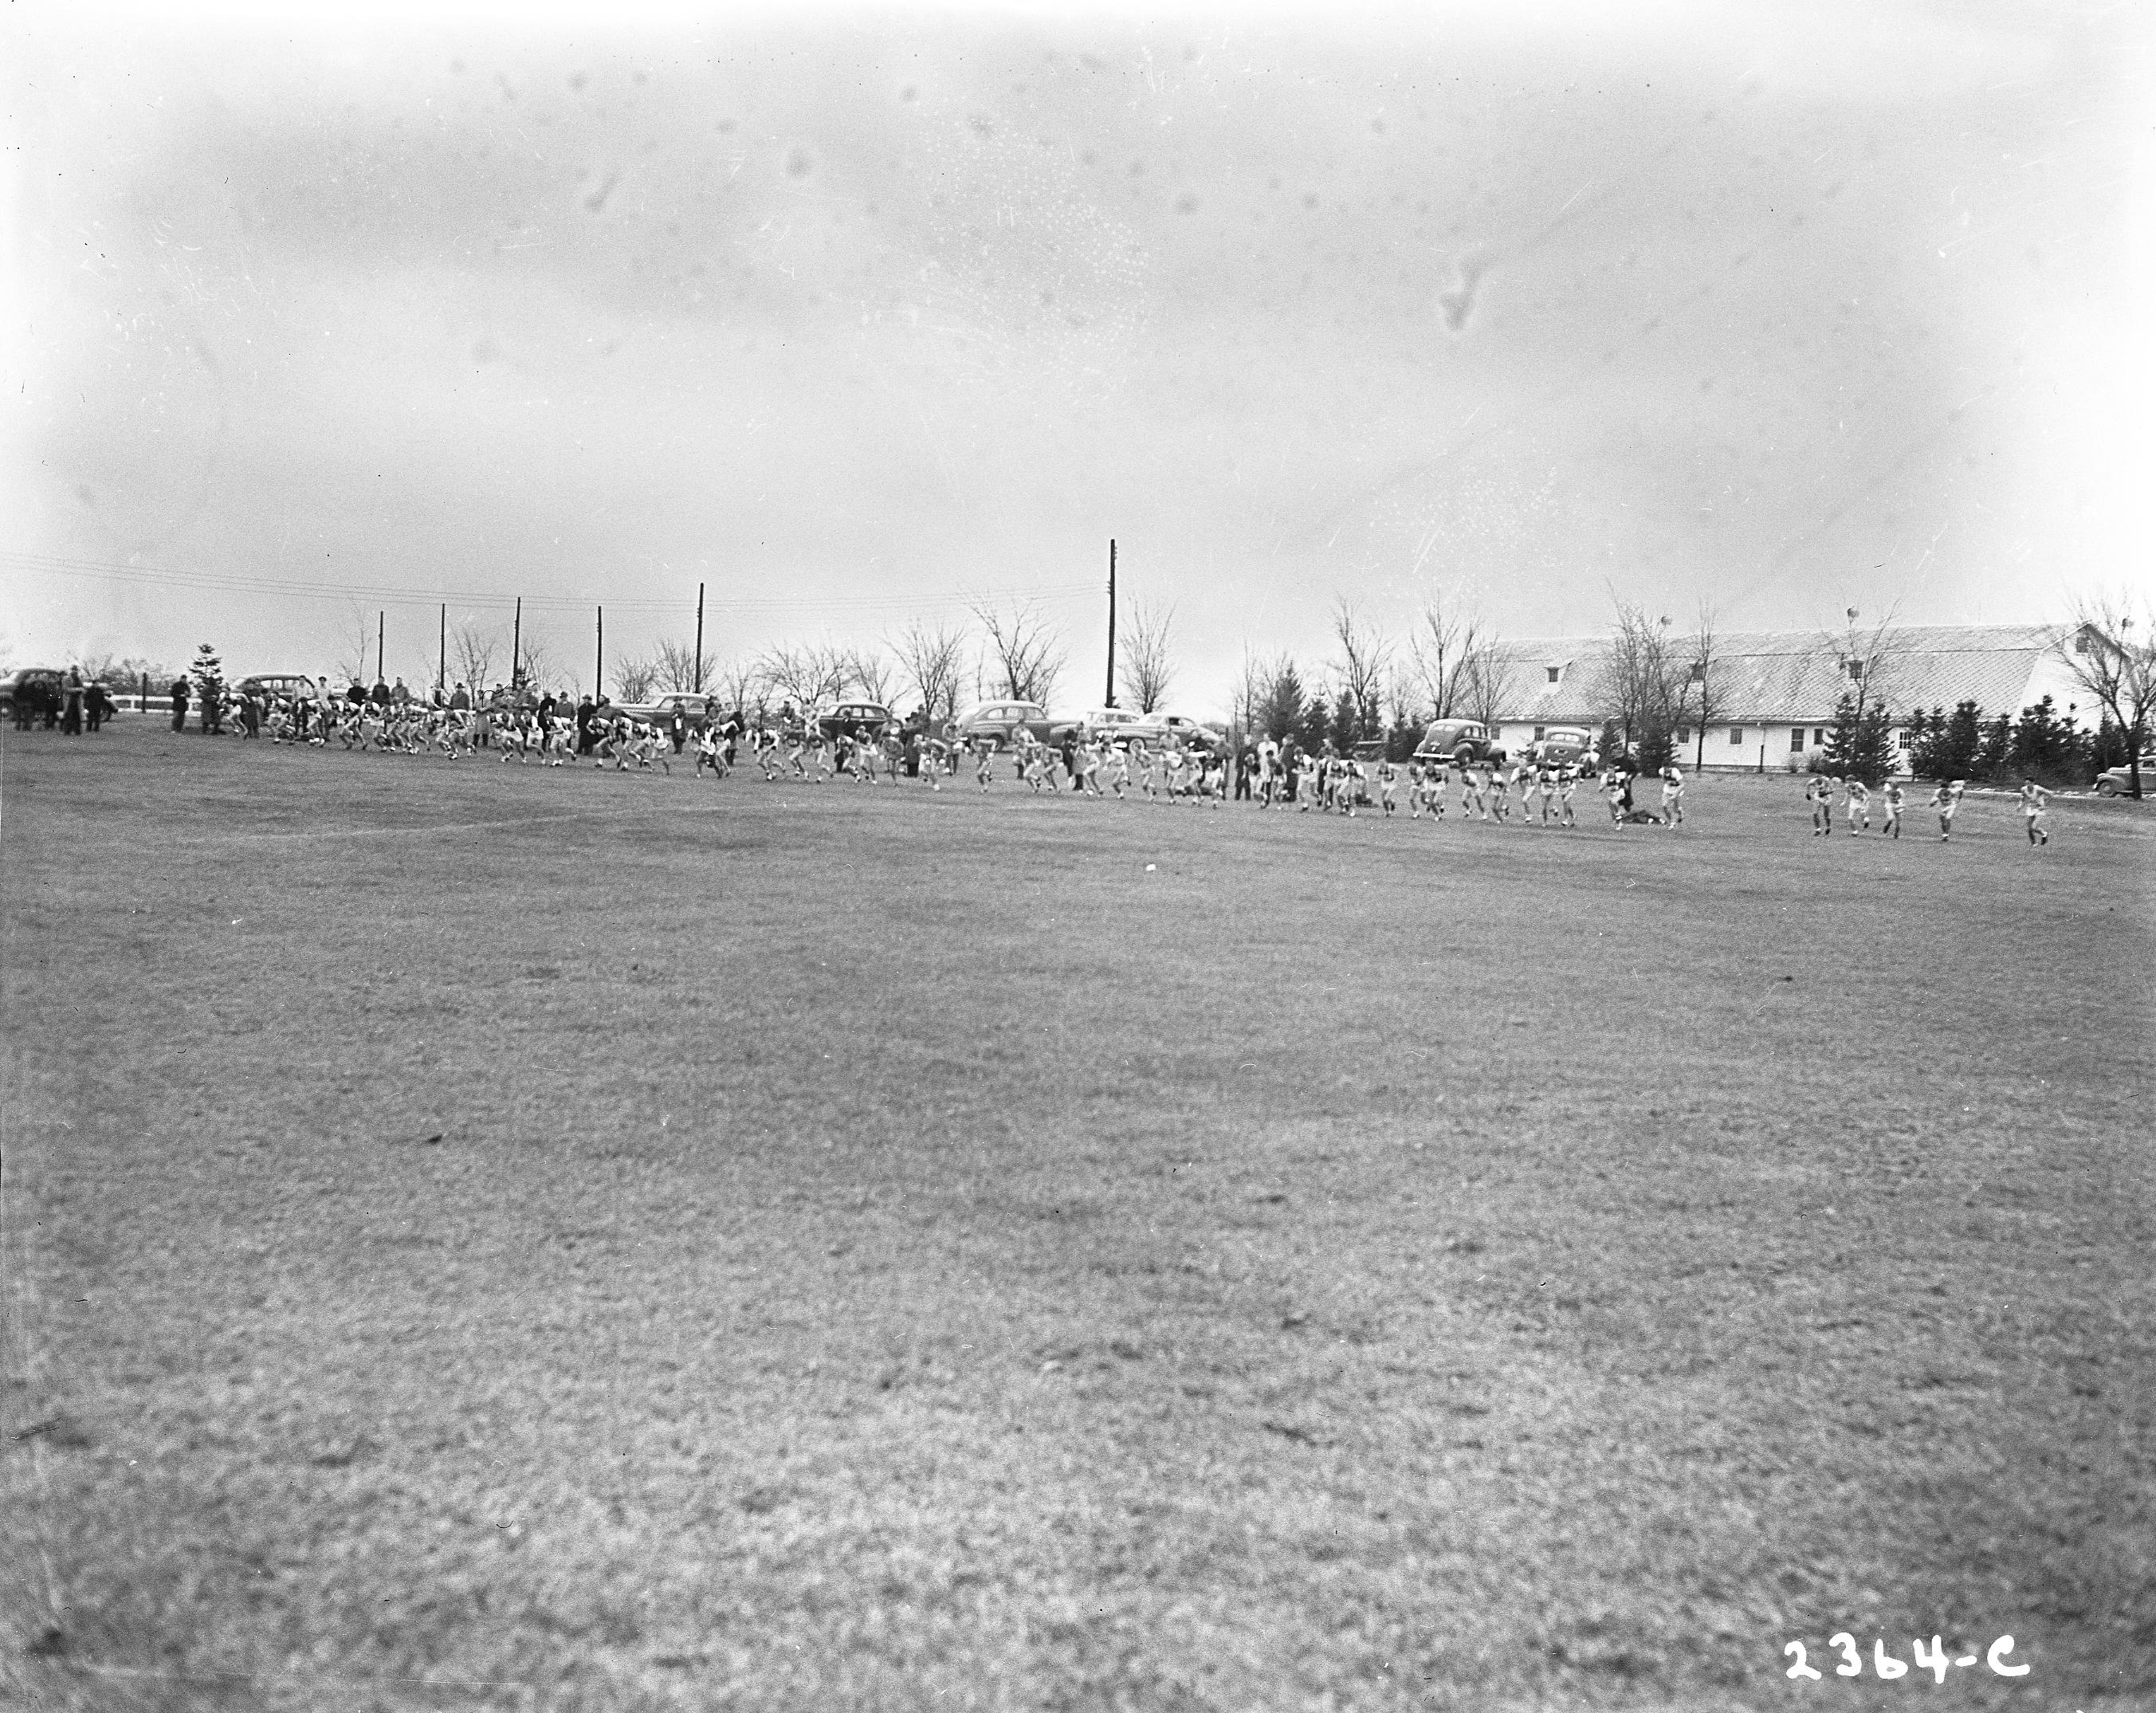 Cross Country meet, circa 1950s